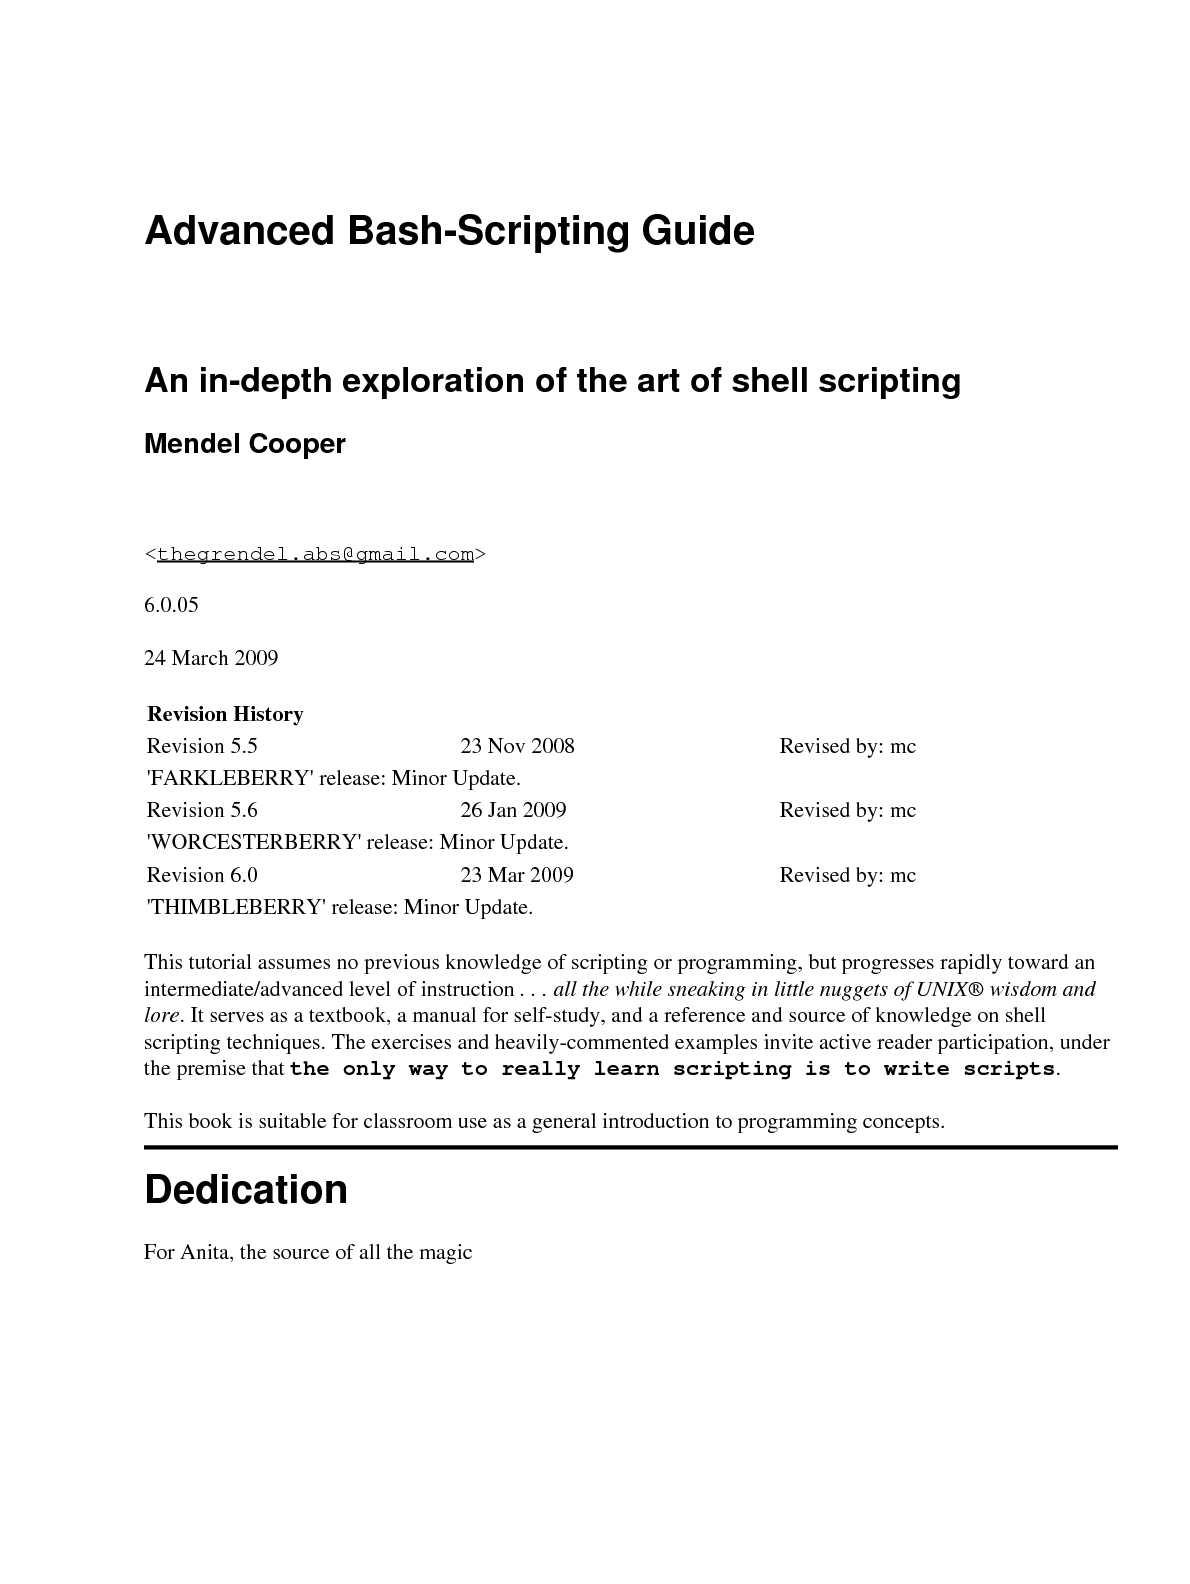 Calaméo - Advanced Bash-Scripting Guide